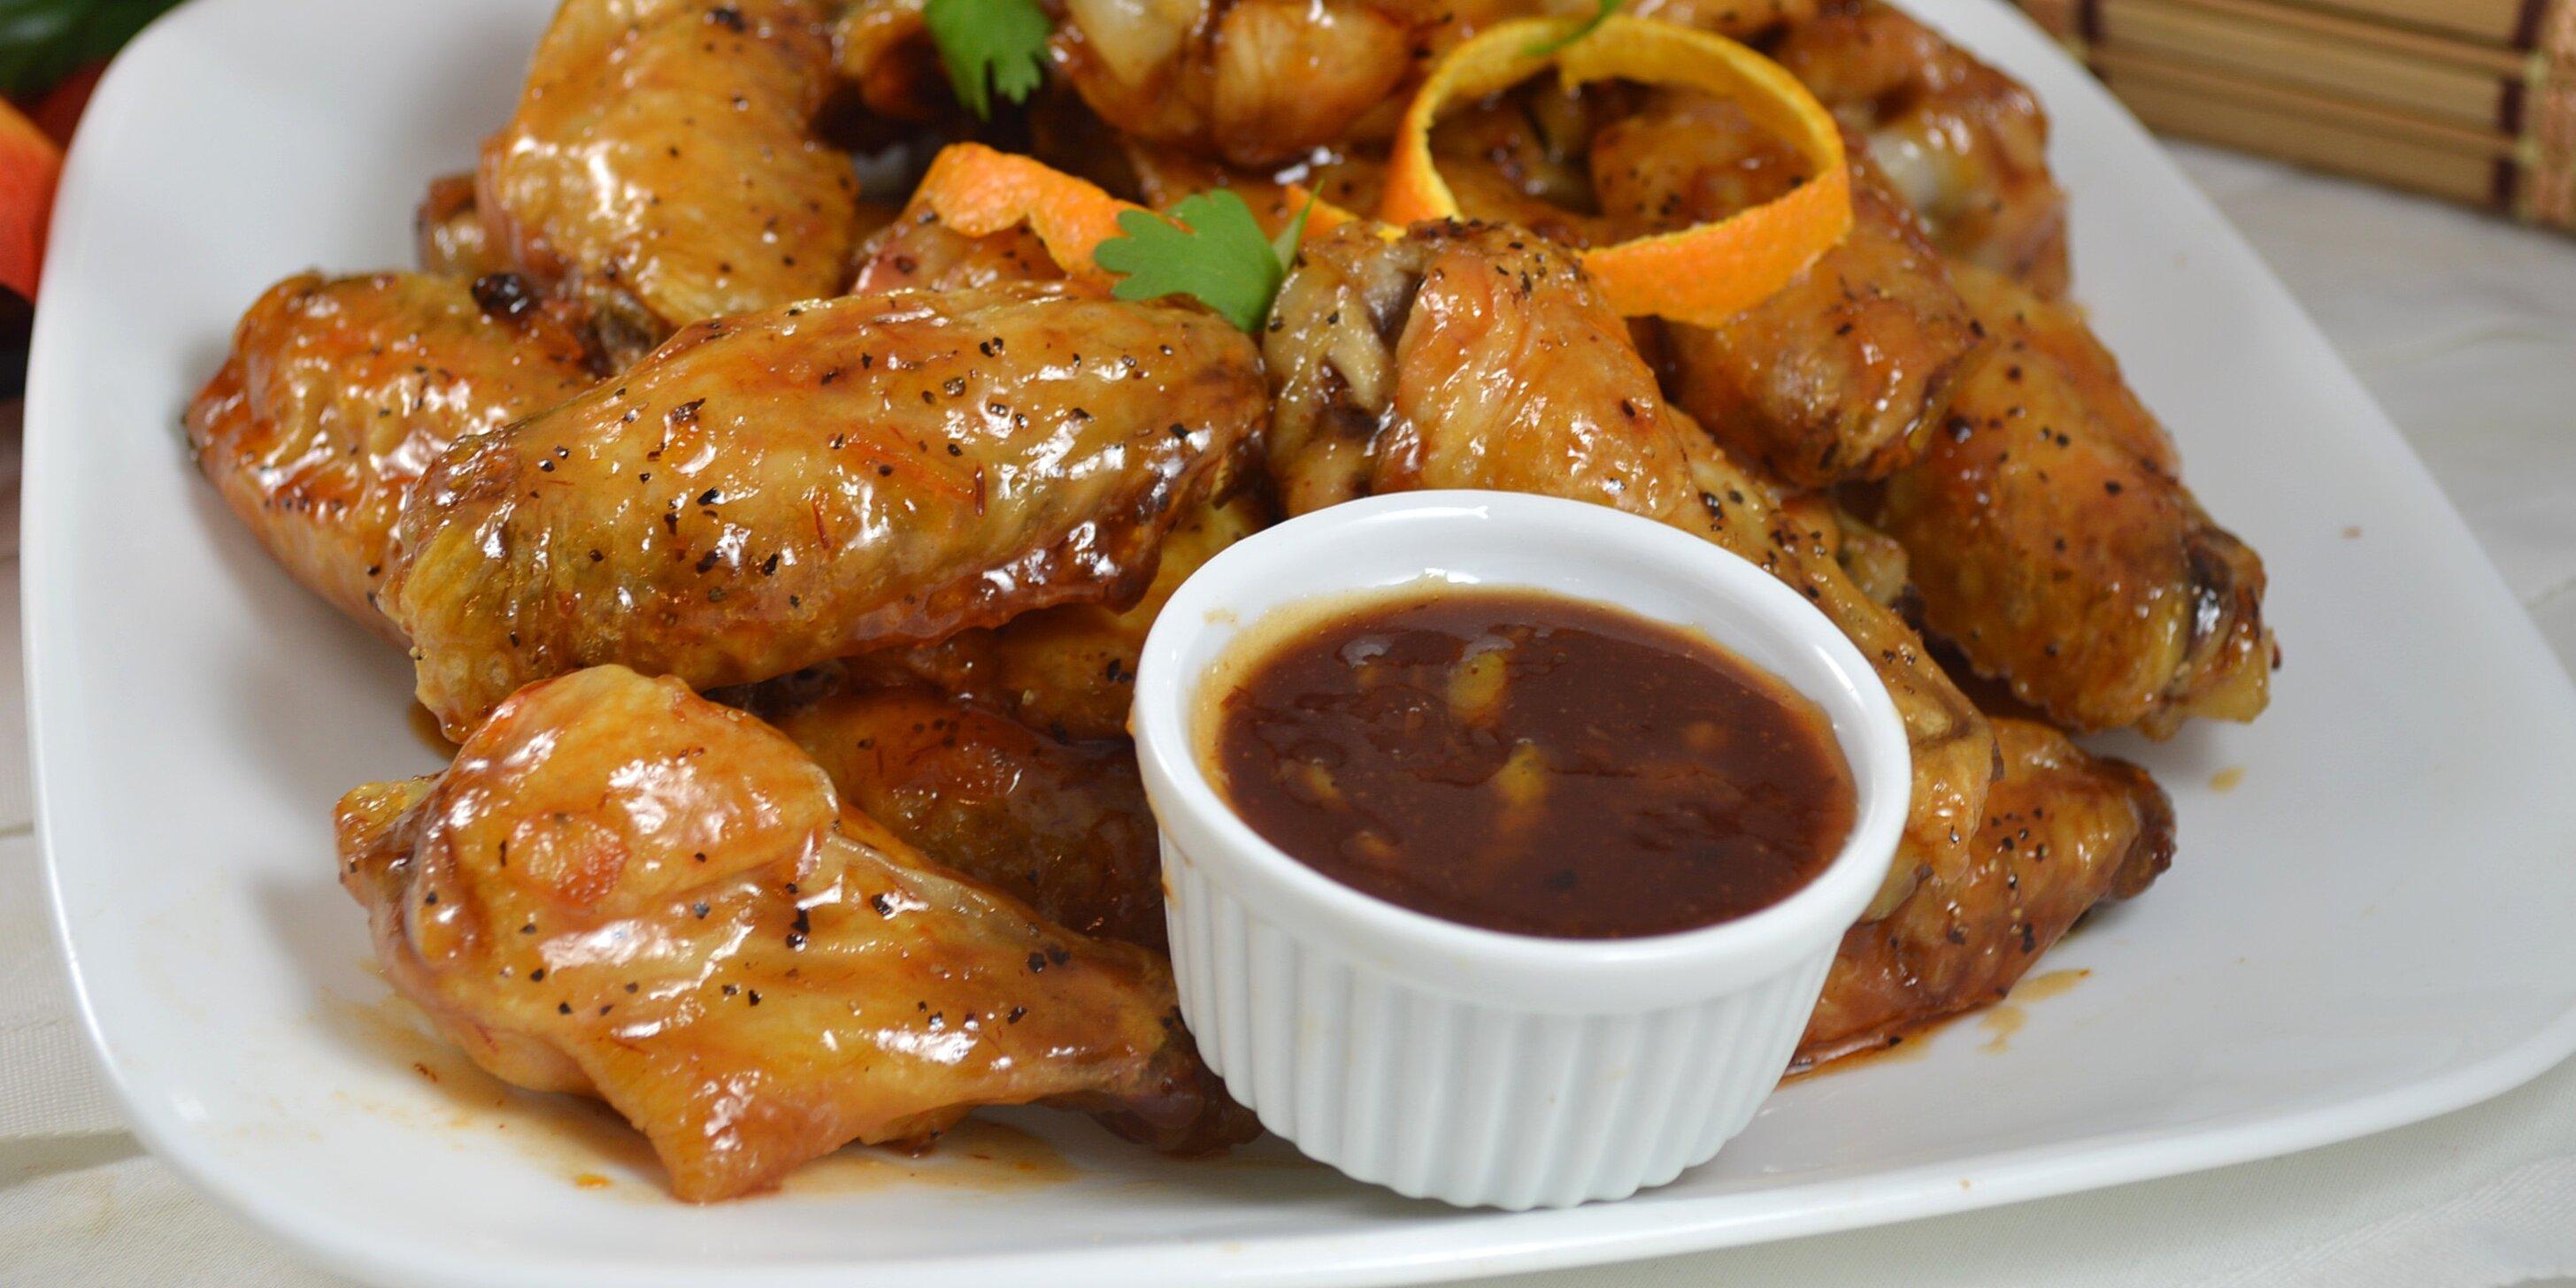 sweet chili and orange marmalade glazed chicken wings recipe